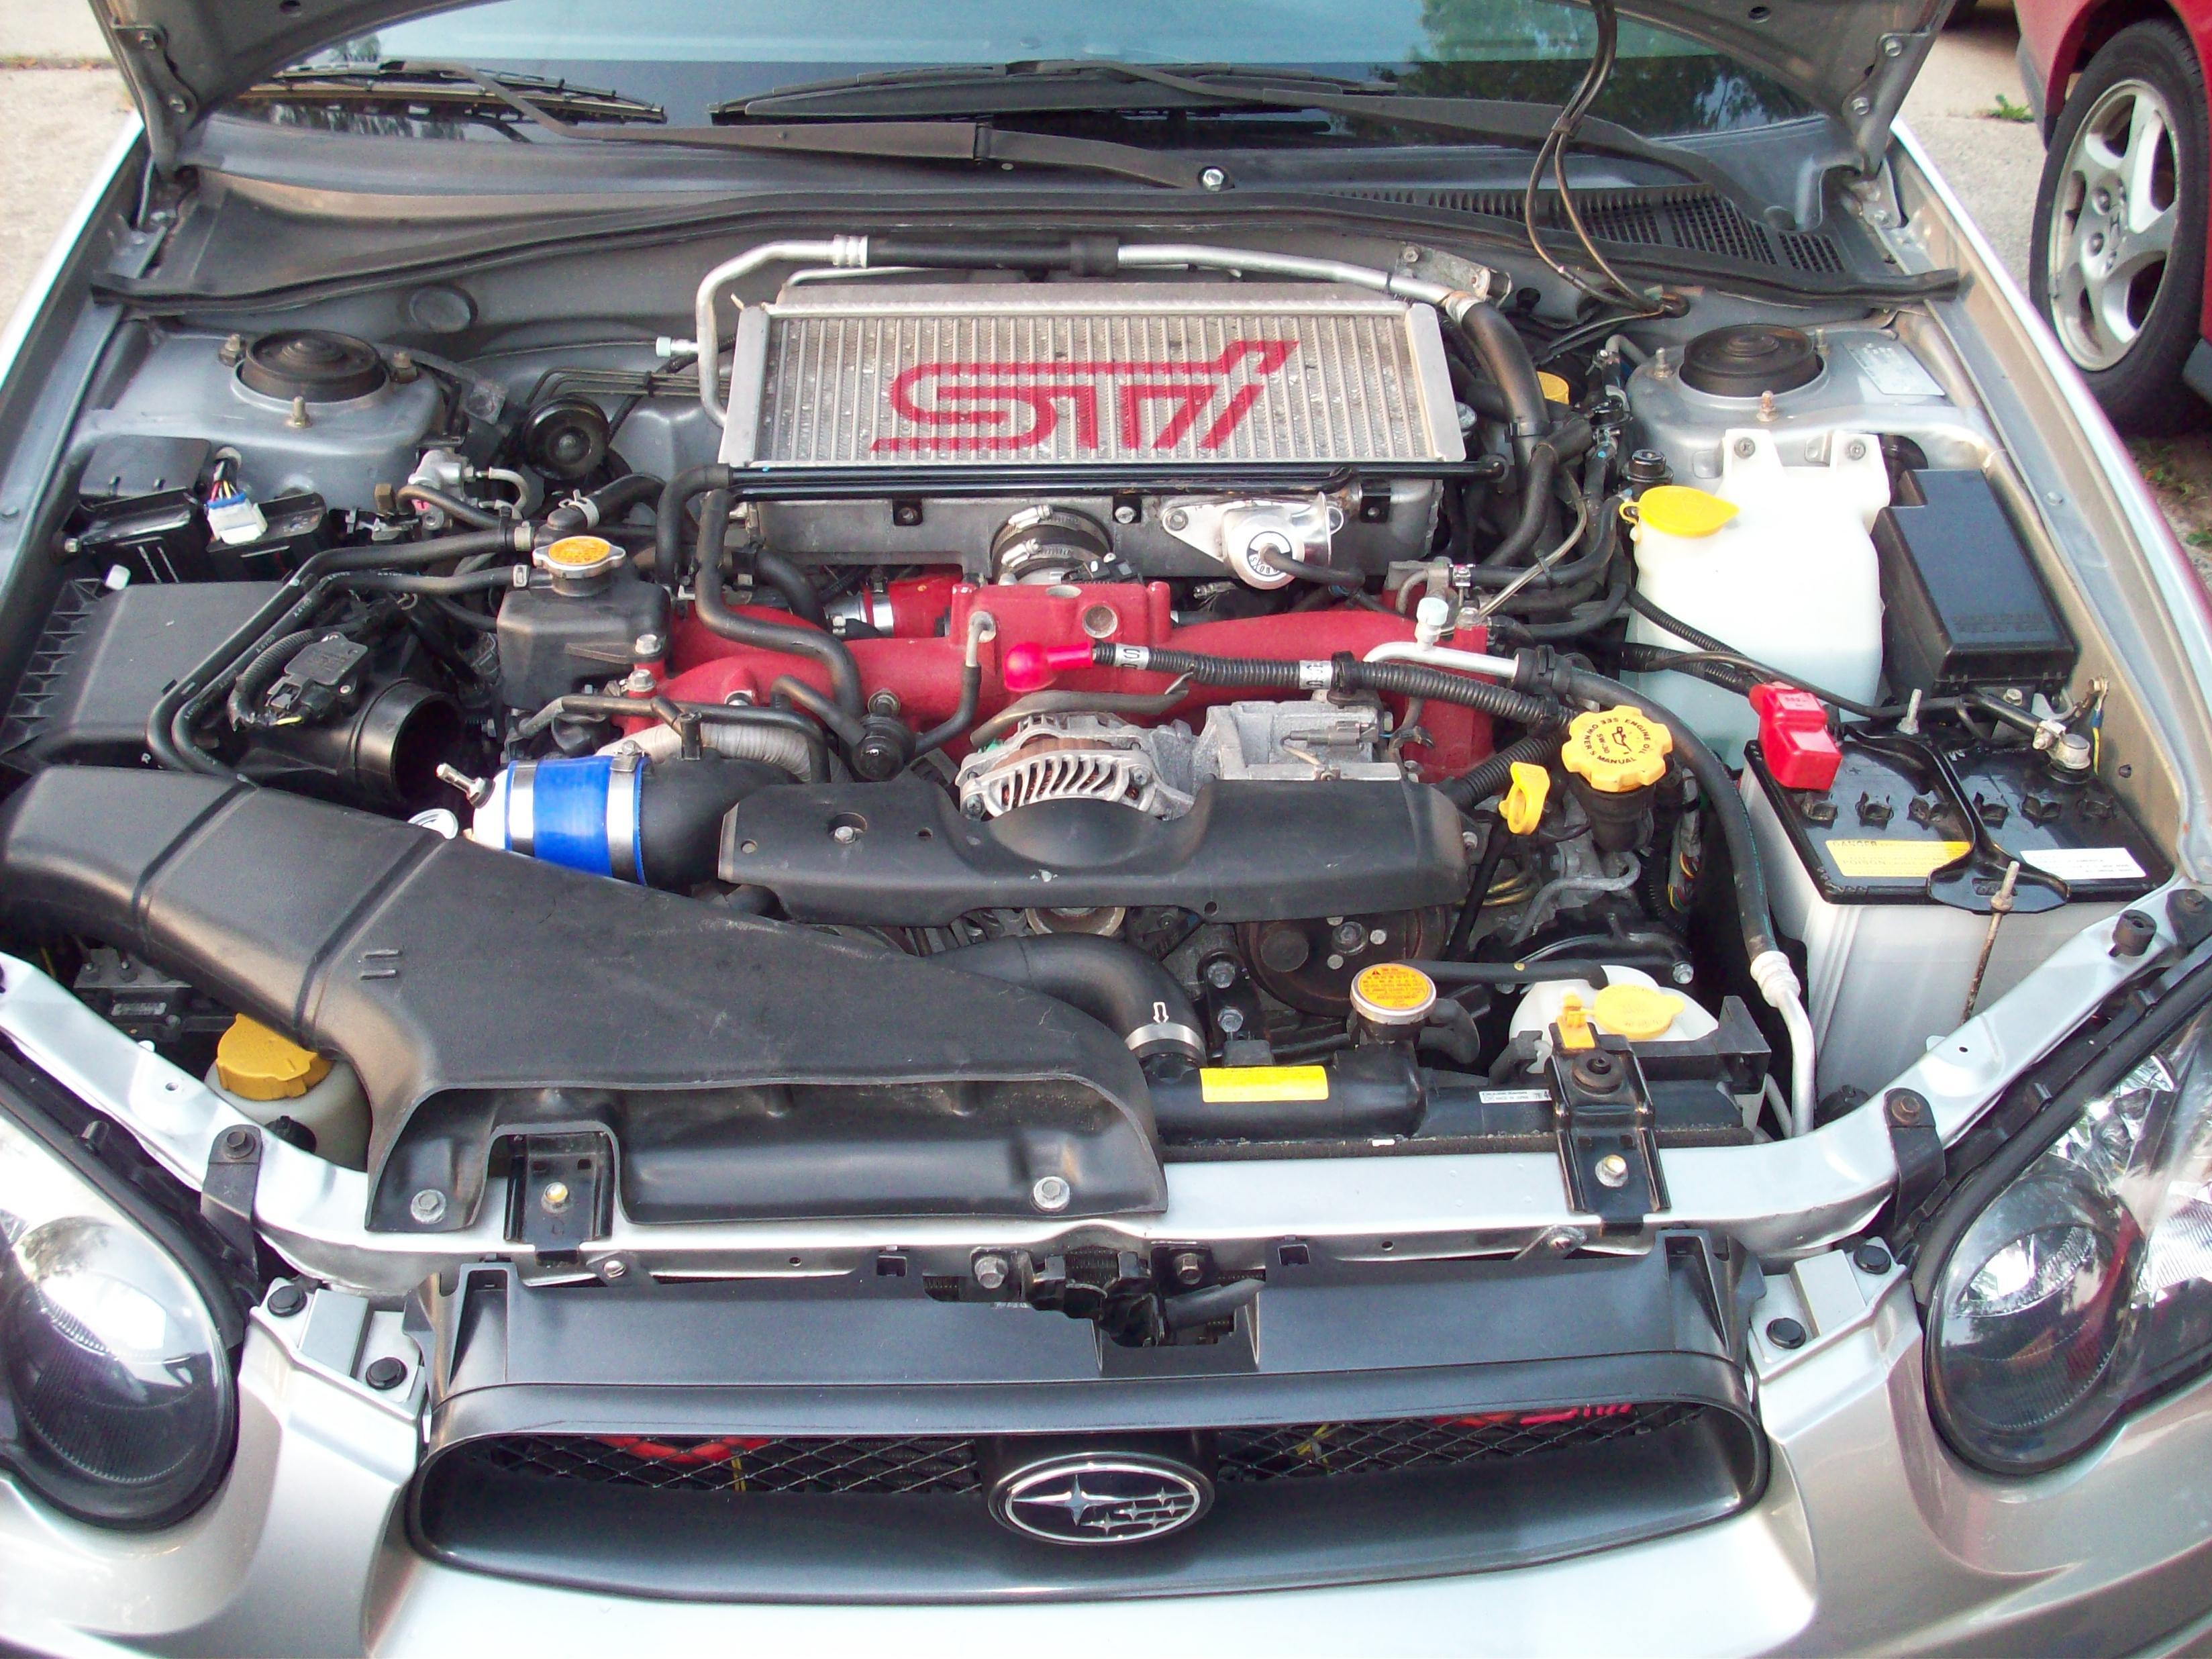 how to boostleak test a subaru rh turboboostleaktesters com Subaru 2 0 Liter 4 Cylinder Subaru